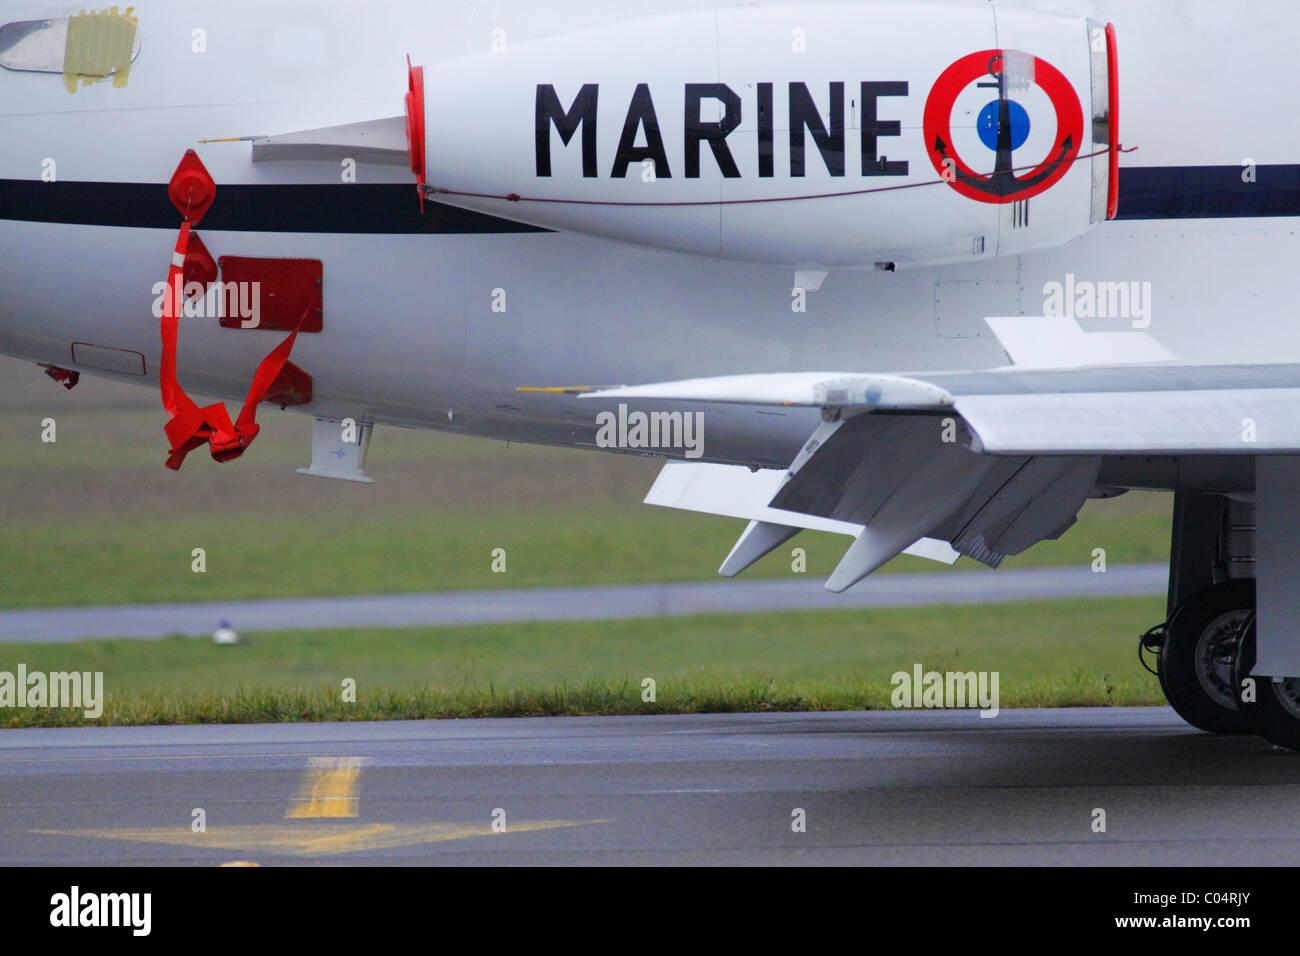 french military airplane marine - Stock Image